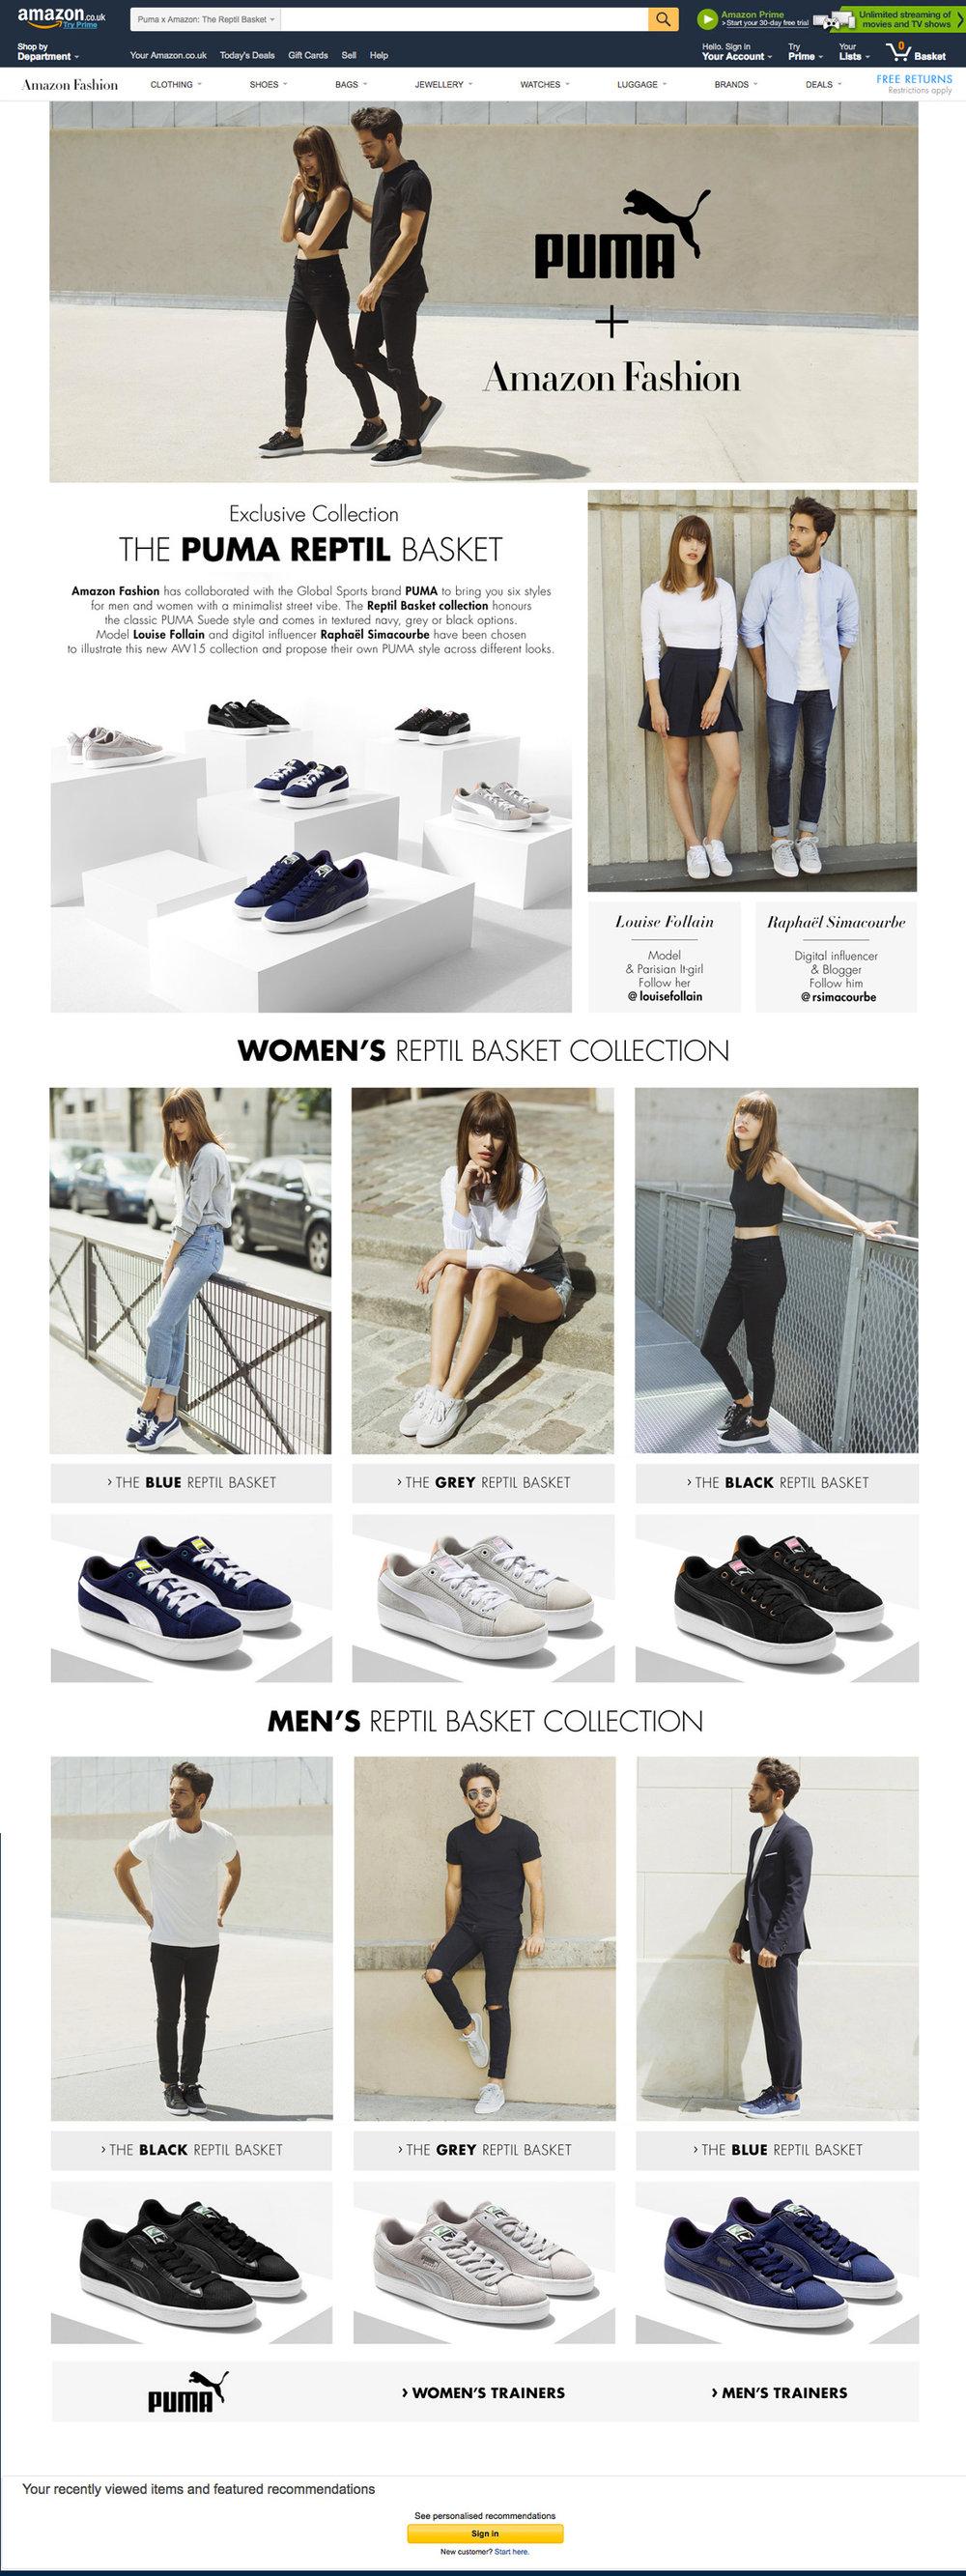 PUMA X Amazon Fashion